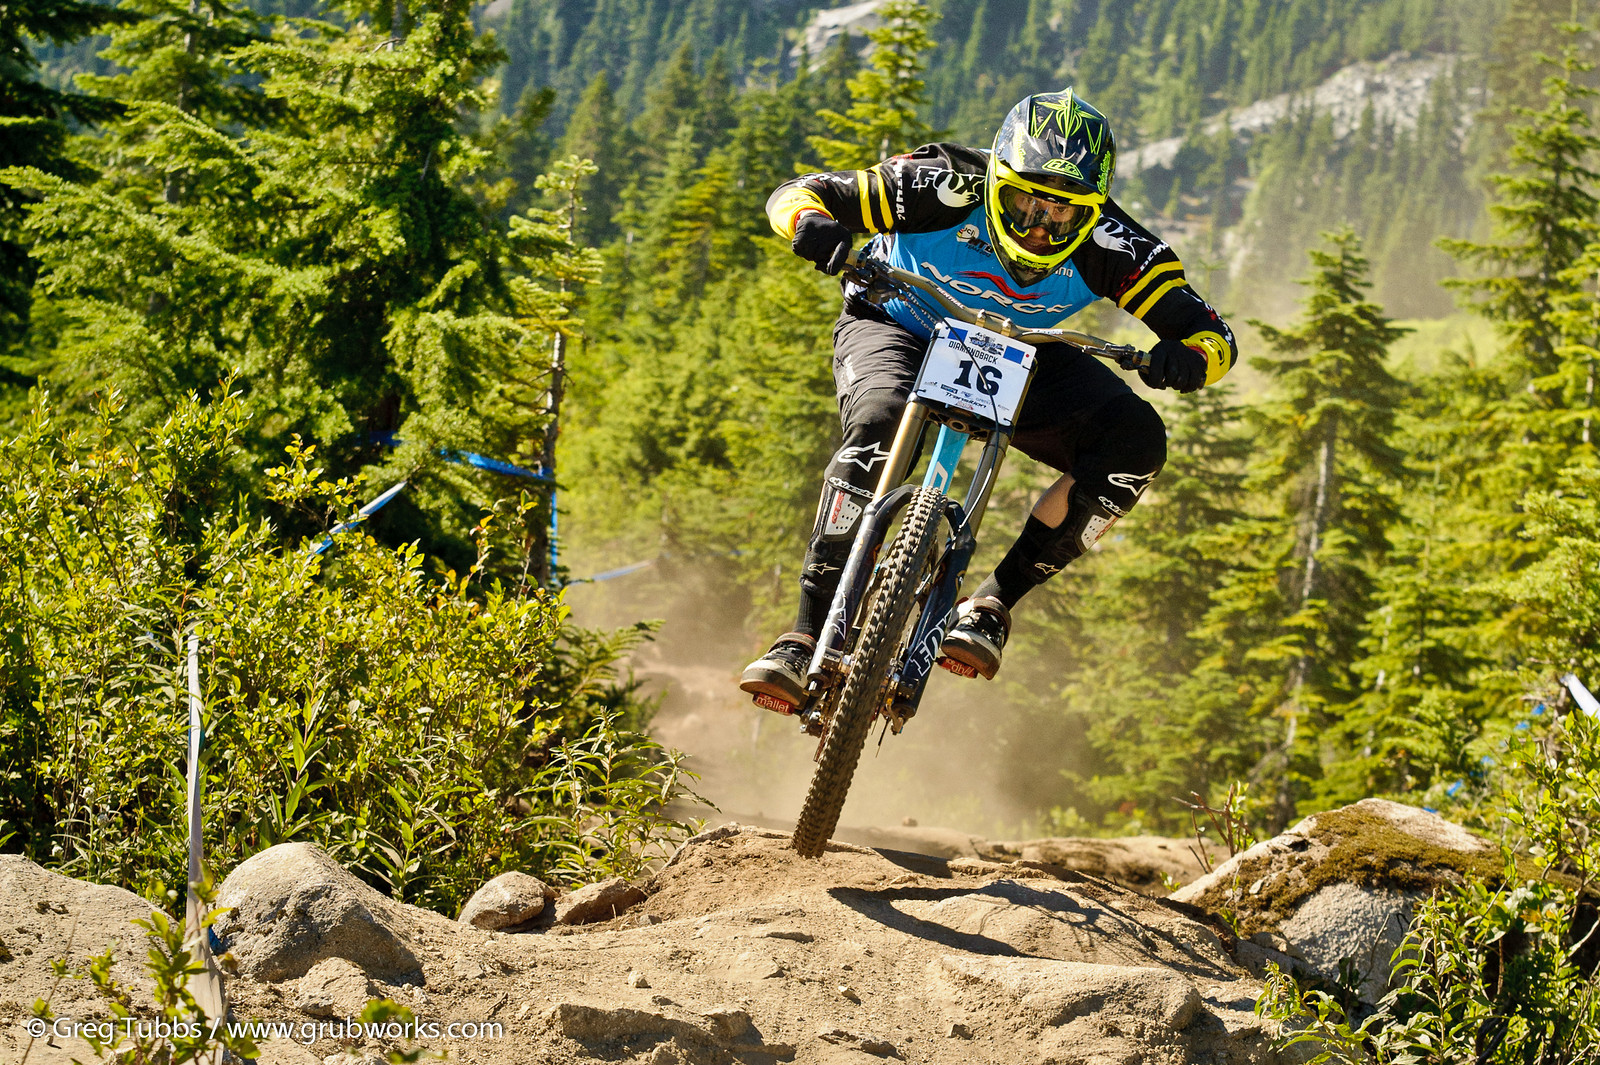 #16 Bryn Atkinson - GGruBB - Mountain Biking Pictures - Vital MTB